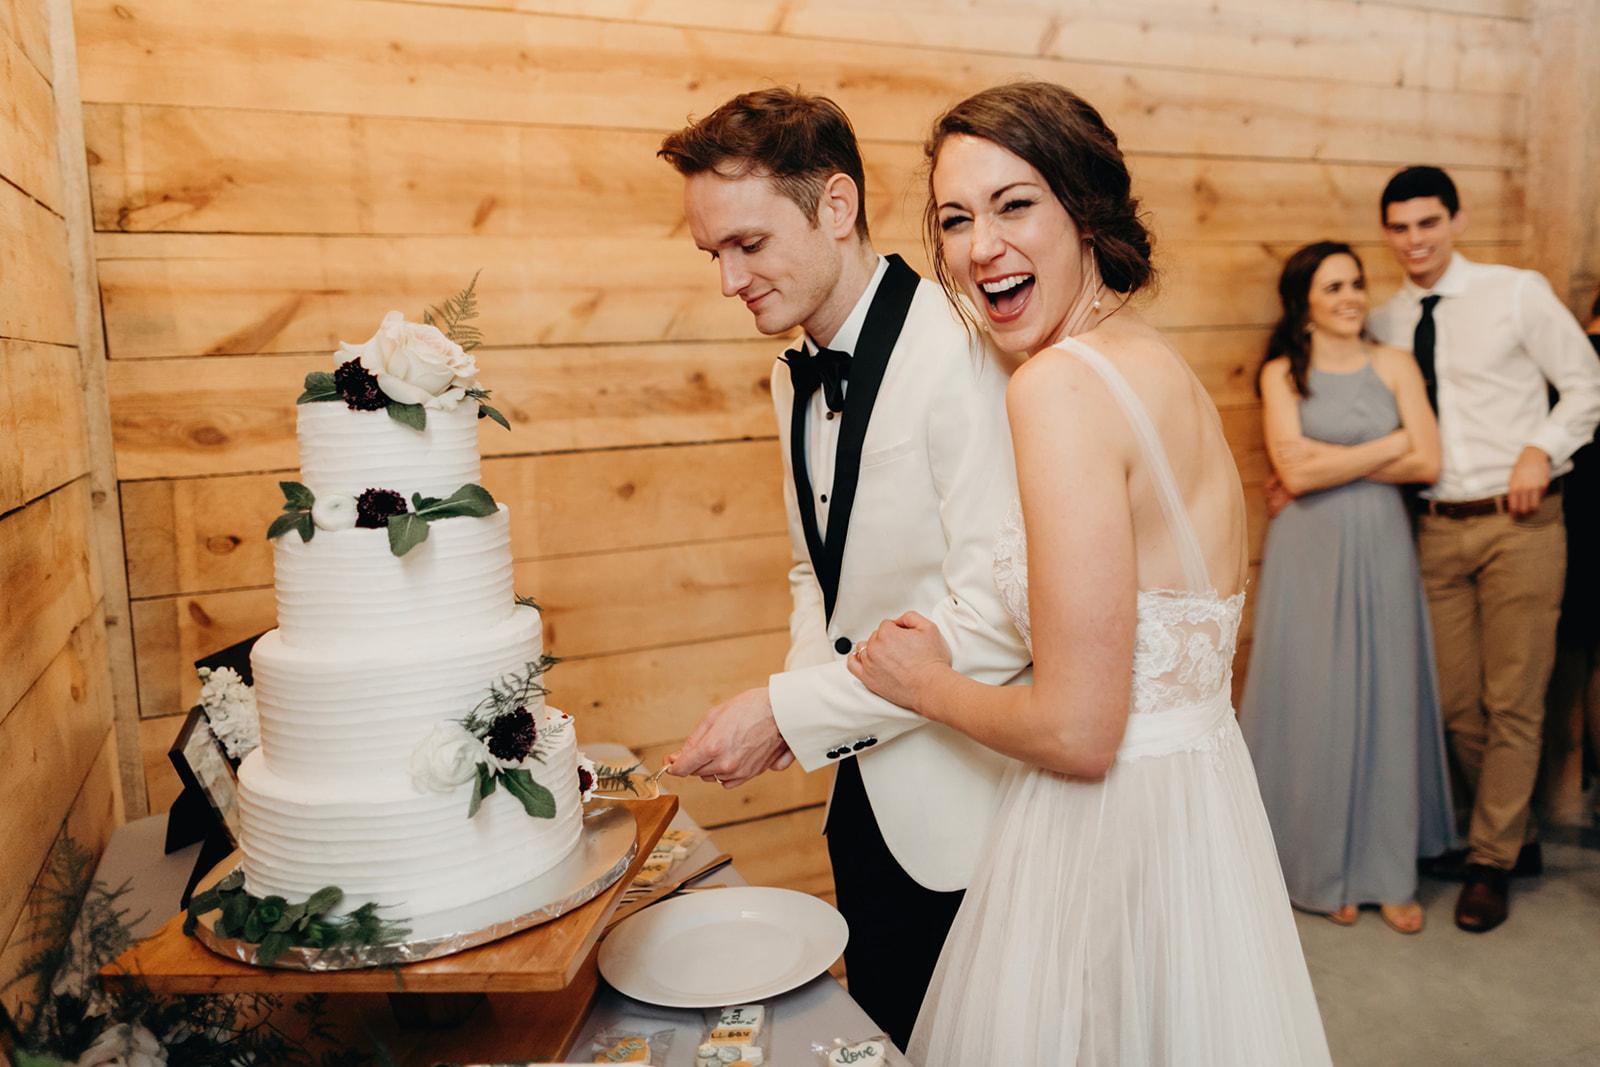 austin-wedding-lindsey-bryce-810.jpg